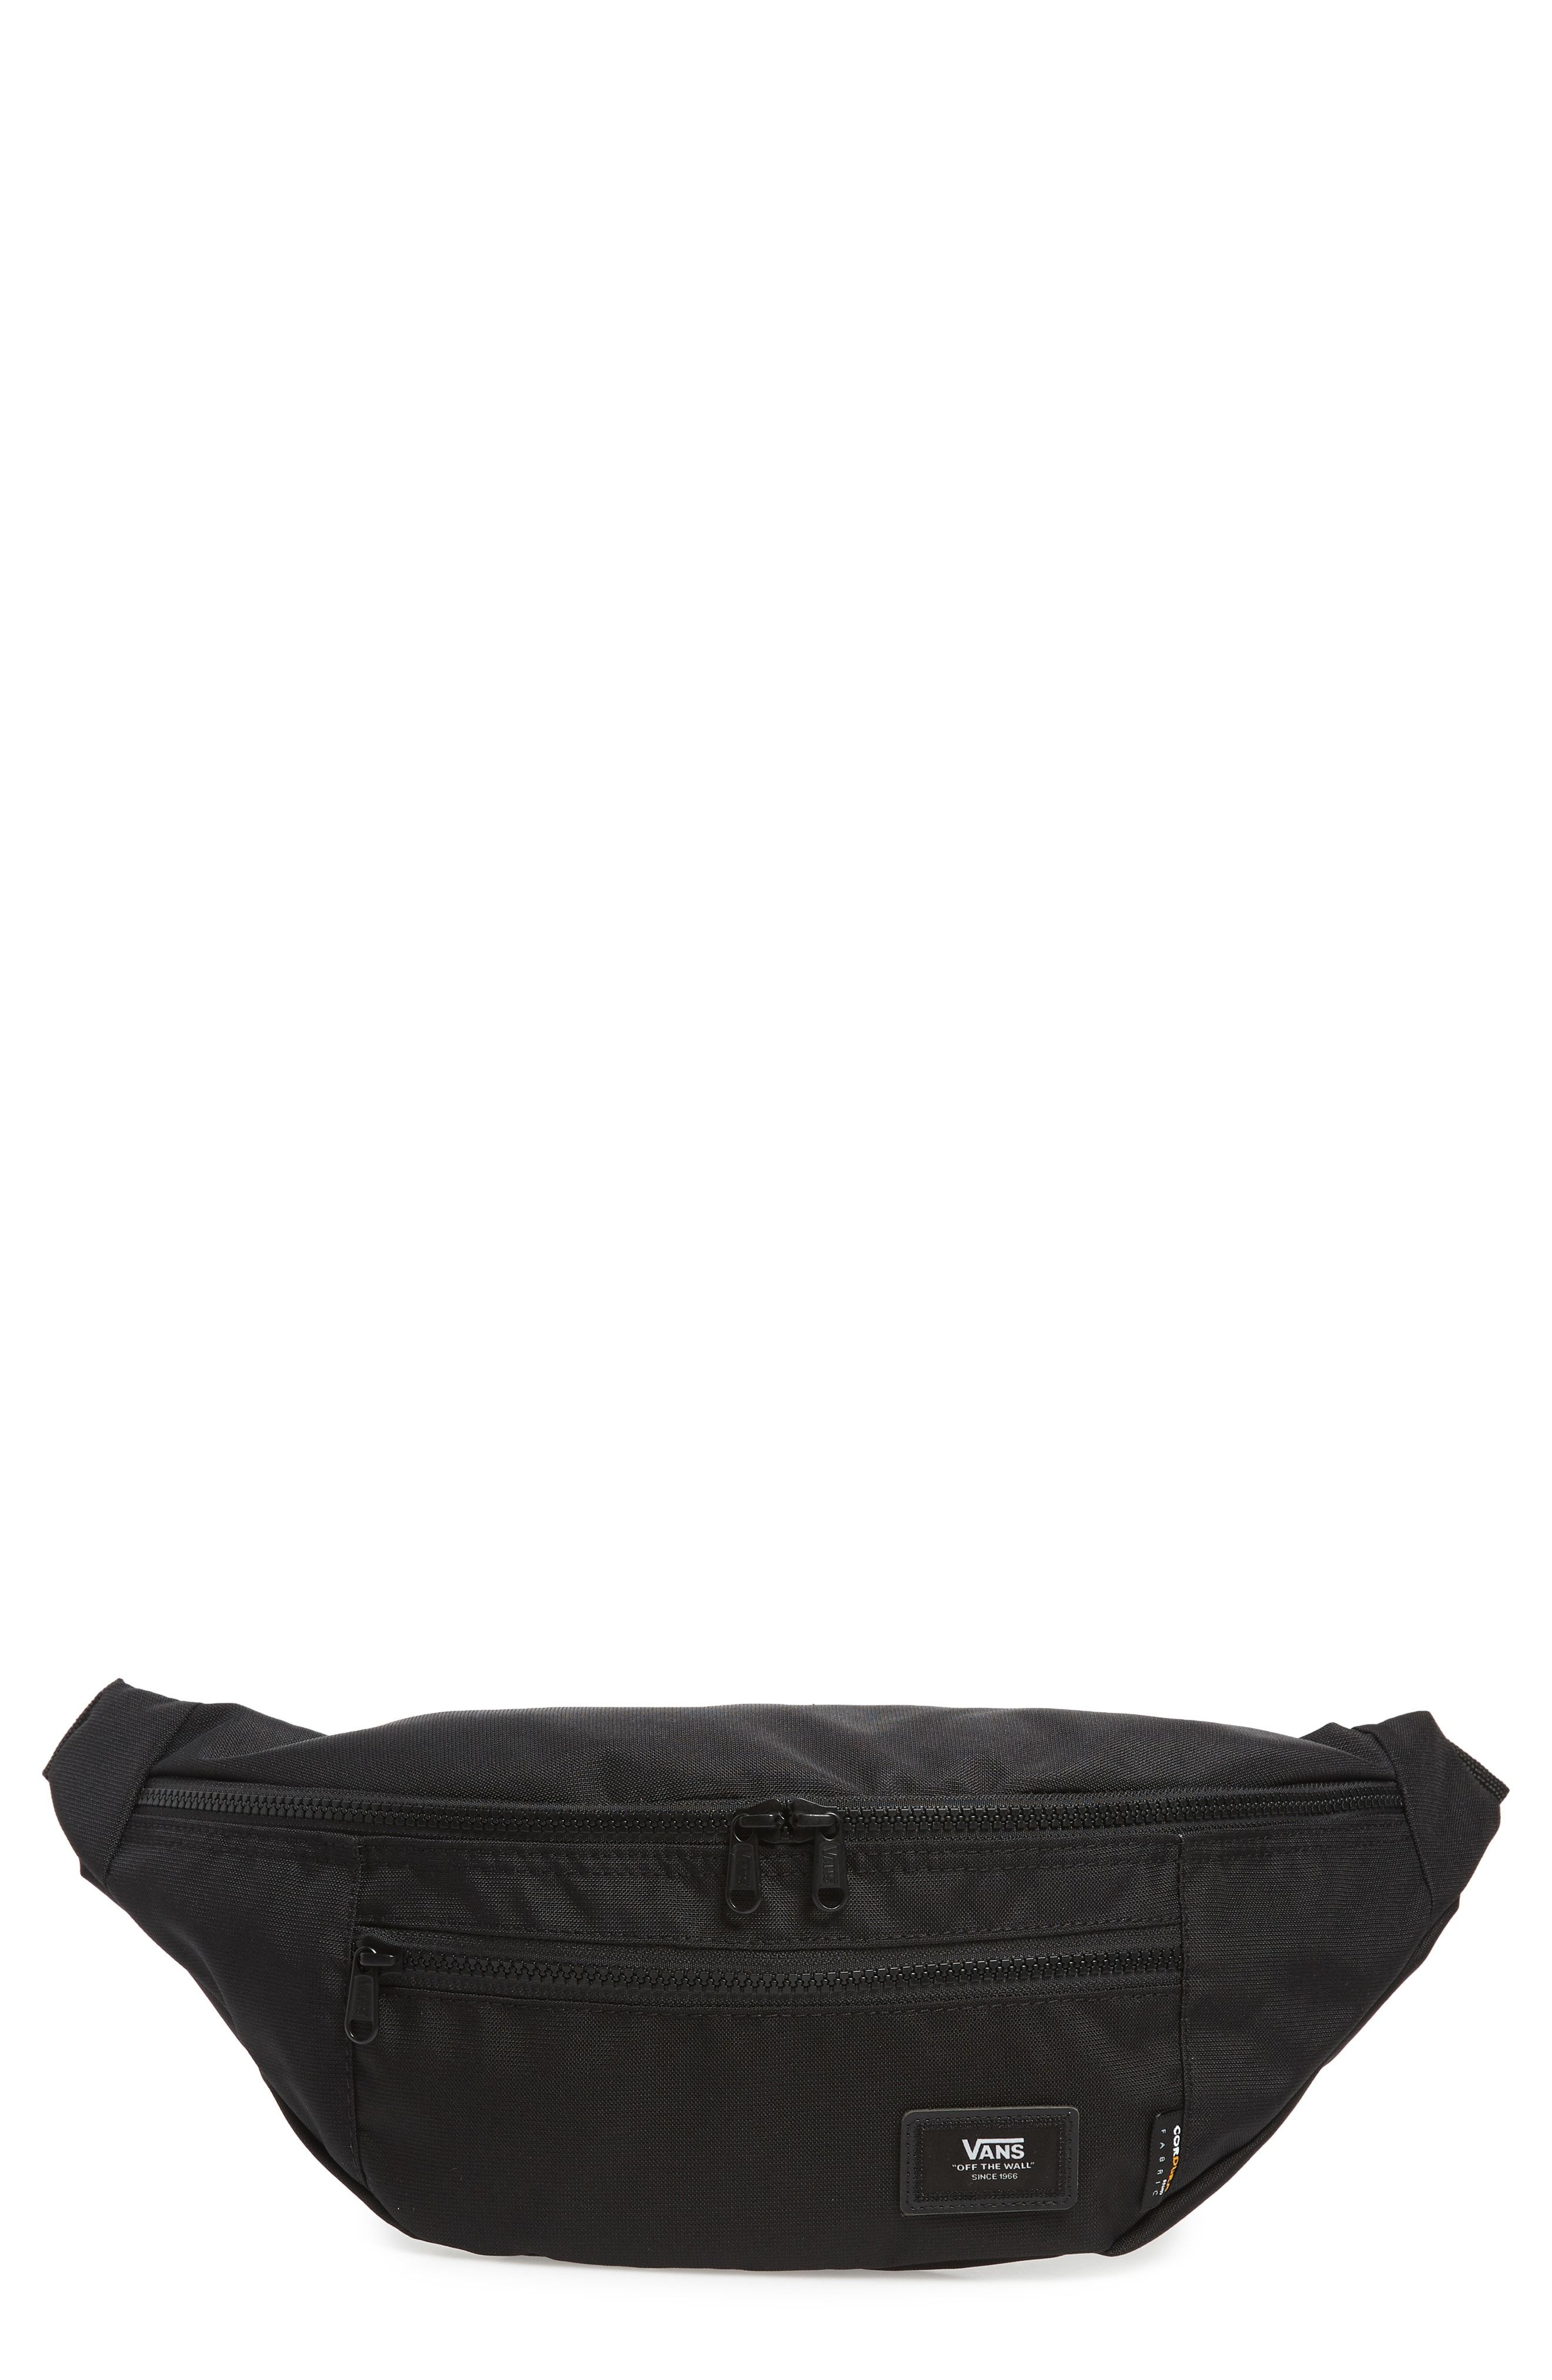 300a52ba71 VANS WARD WATER REPELLENT WAIST PACK - BLACK.  vans  bags  canvas  polyester